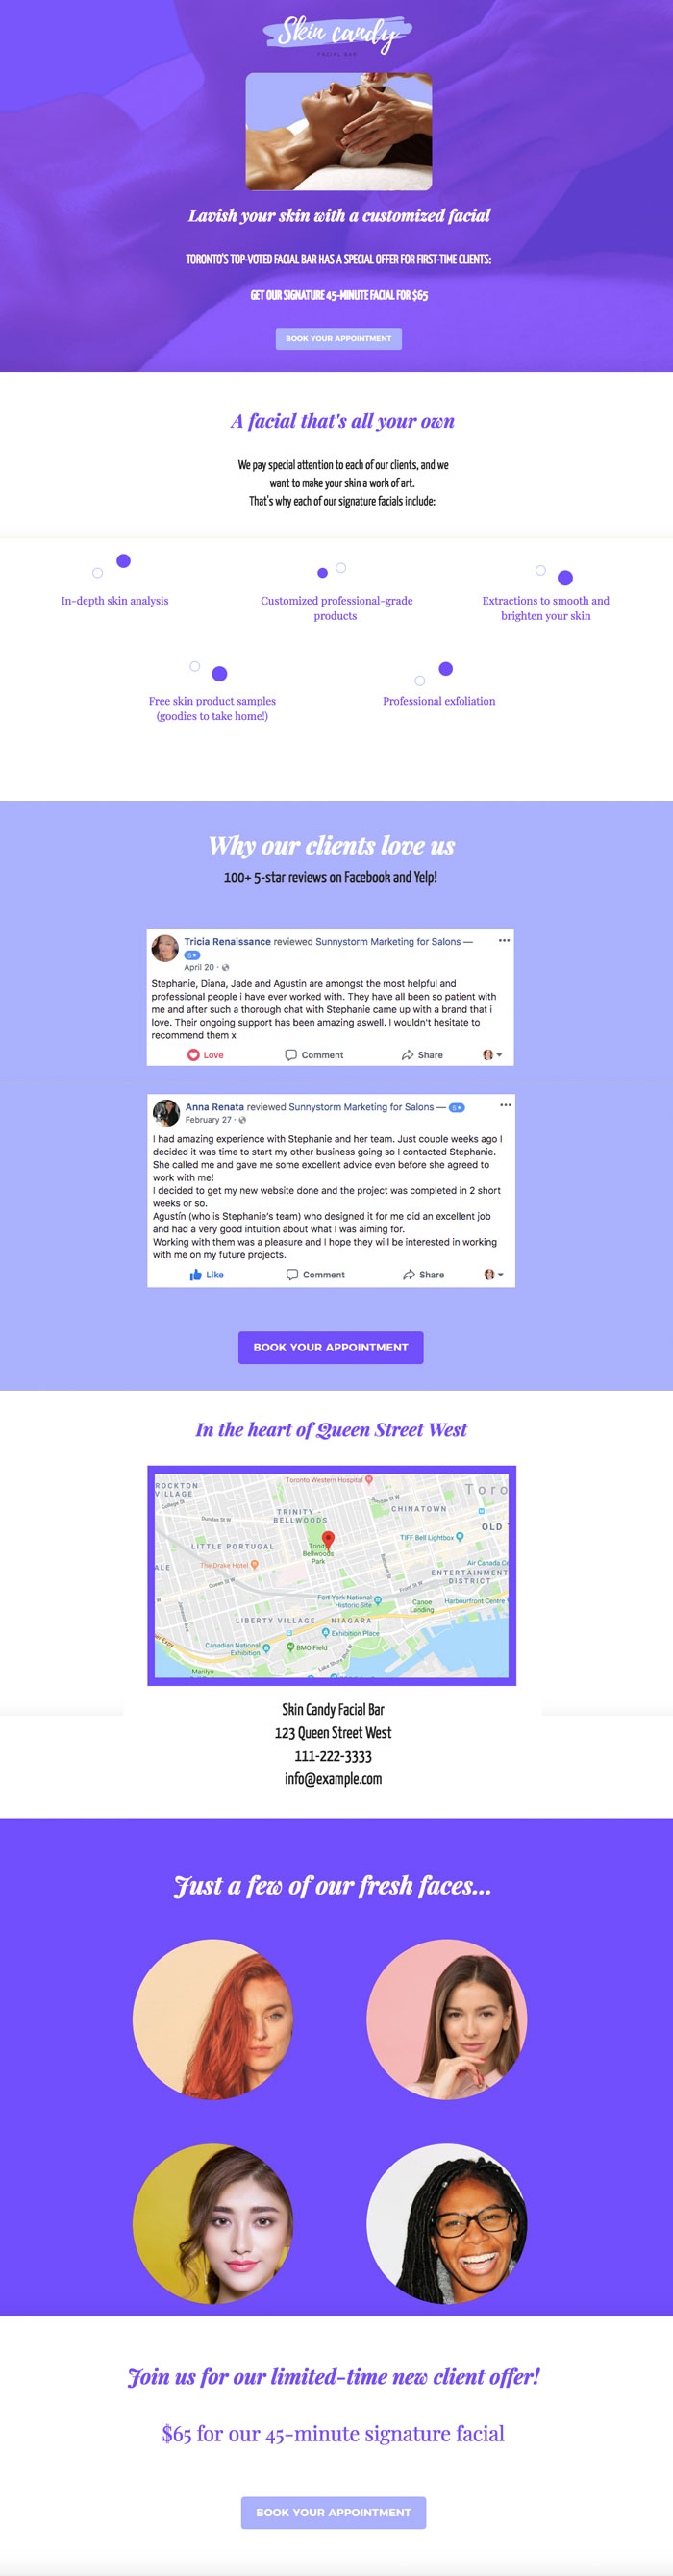 salon-google-ads-instapage.jpg